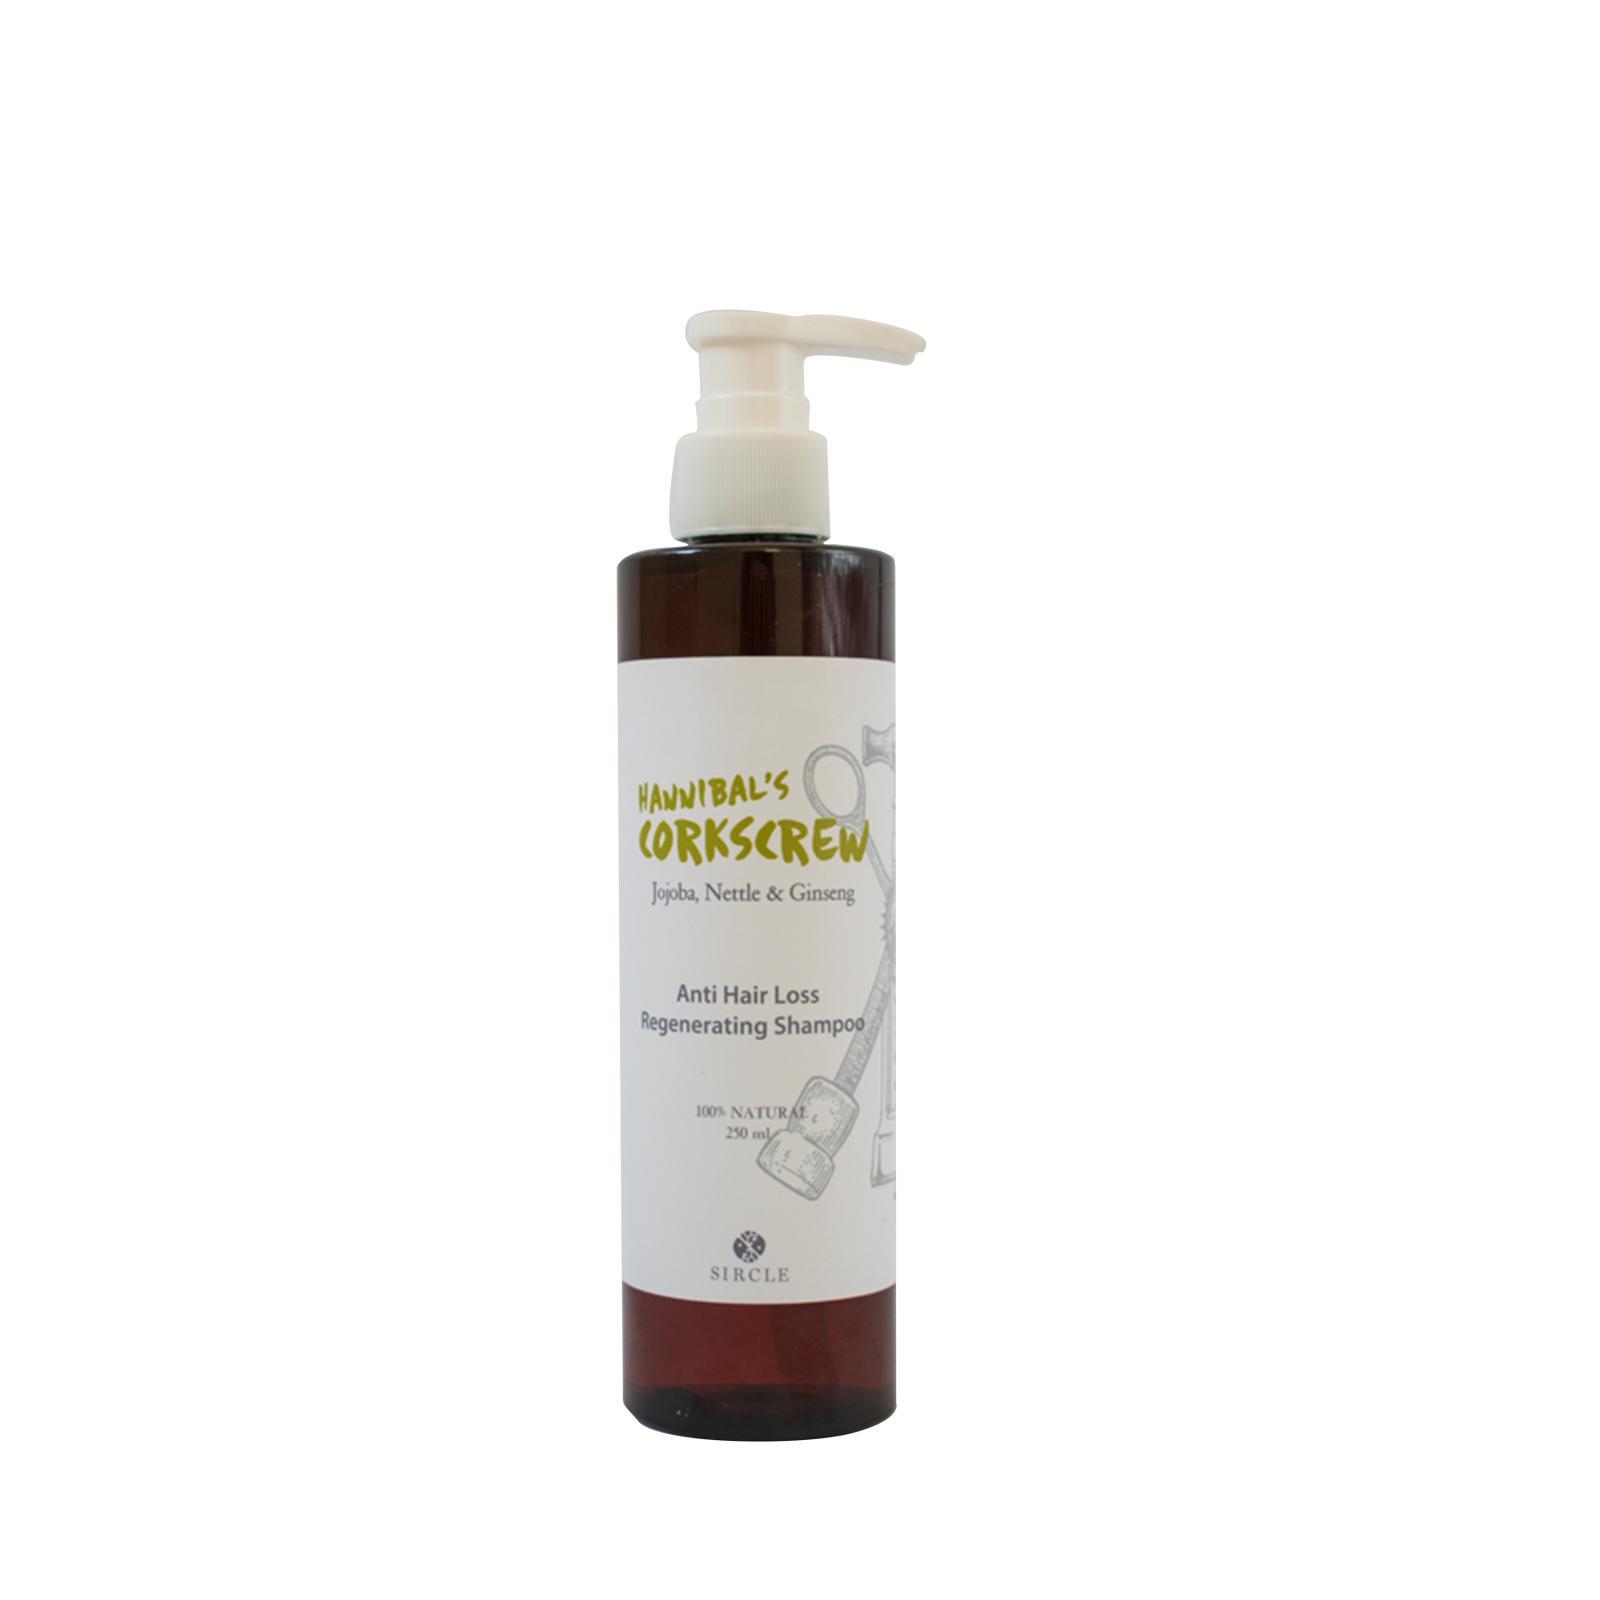 Sircle Hannibals Corkscrew, šampón proti padání vlasů unisex 250 ml